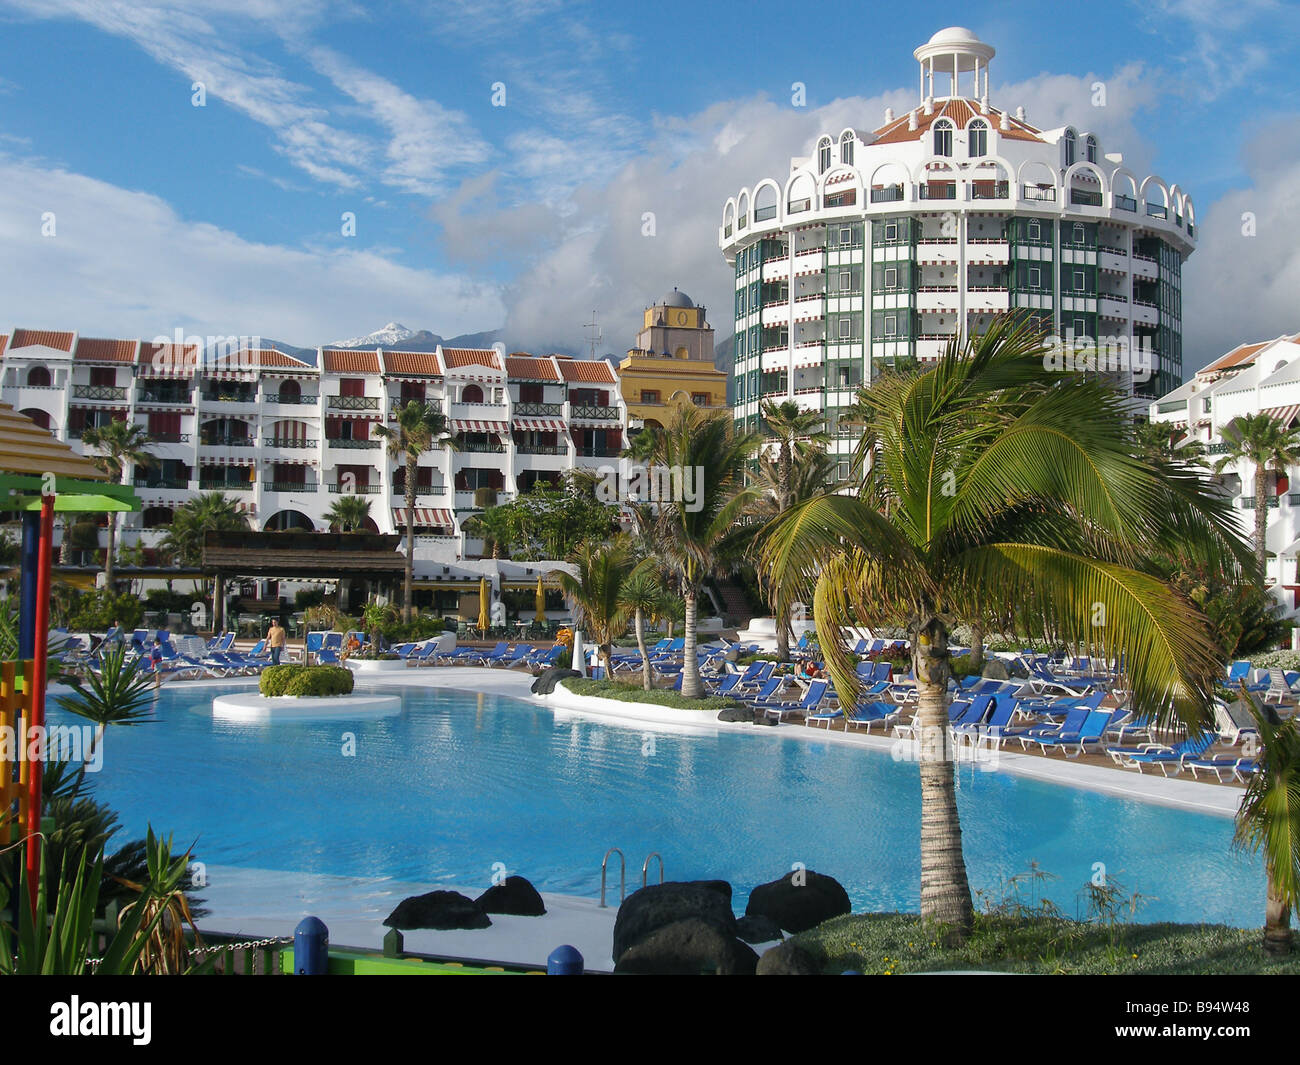 Hotel De Las Americas Tourist Paradise Playa De Las Americas In Tenerife Is A Seaside